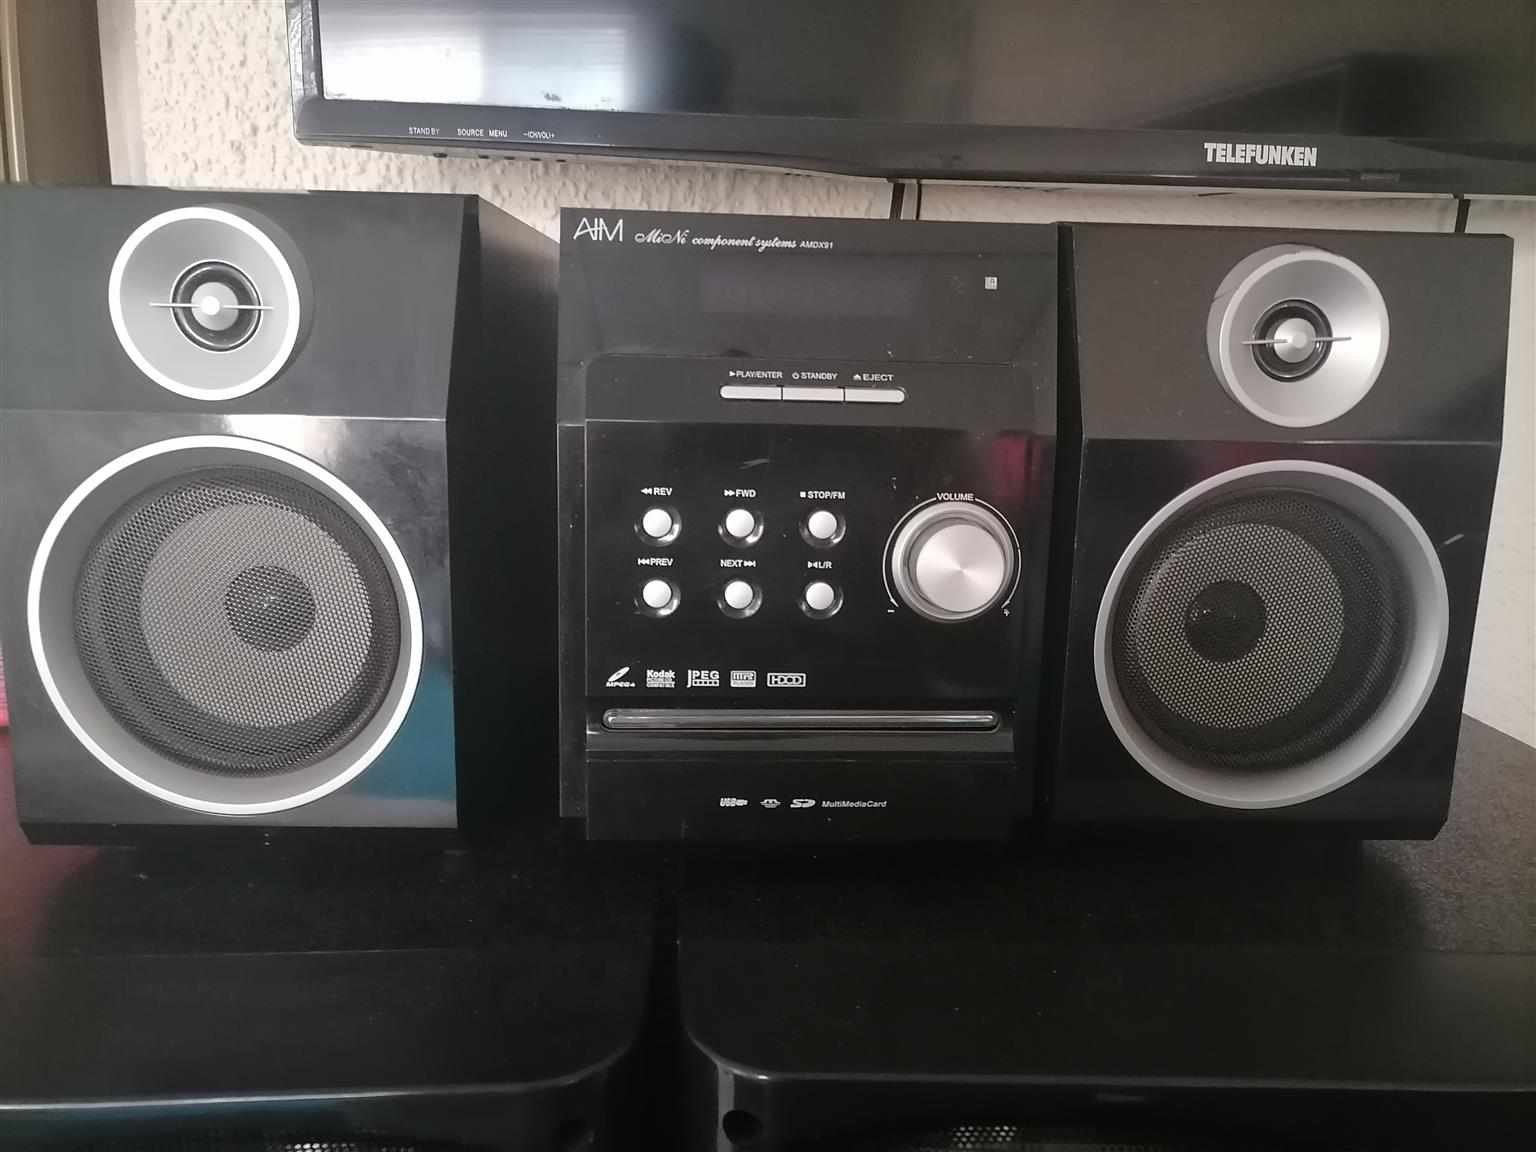 "39"" Telefunken led TV with mini hifi DVD player"